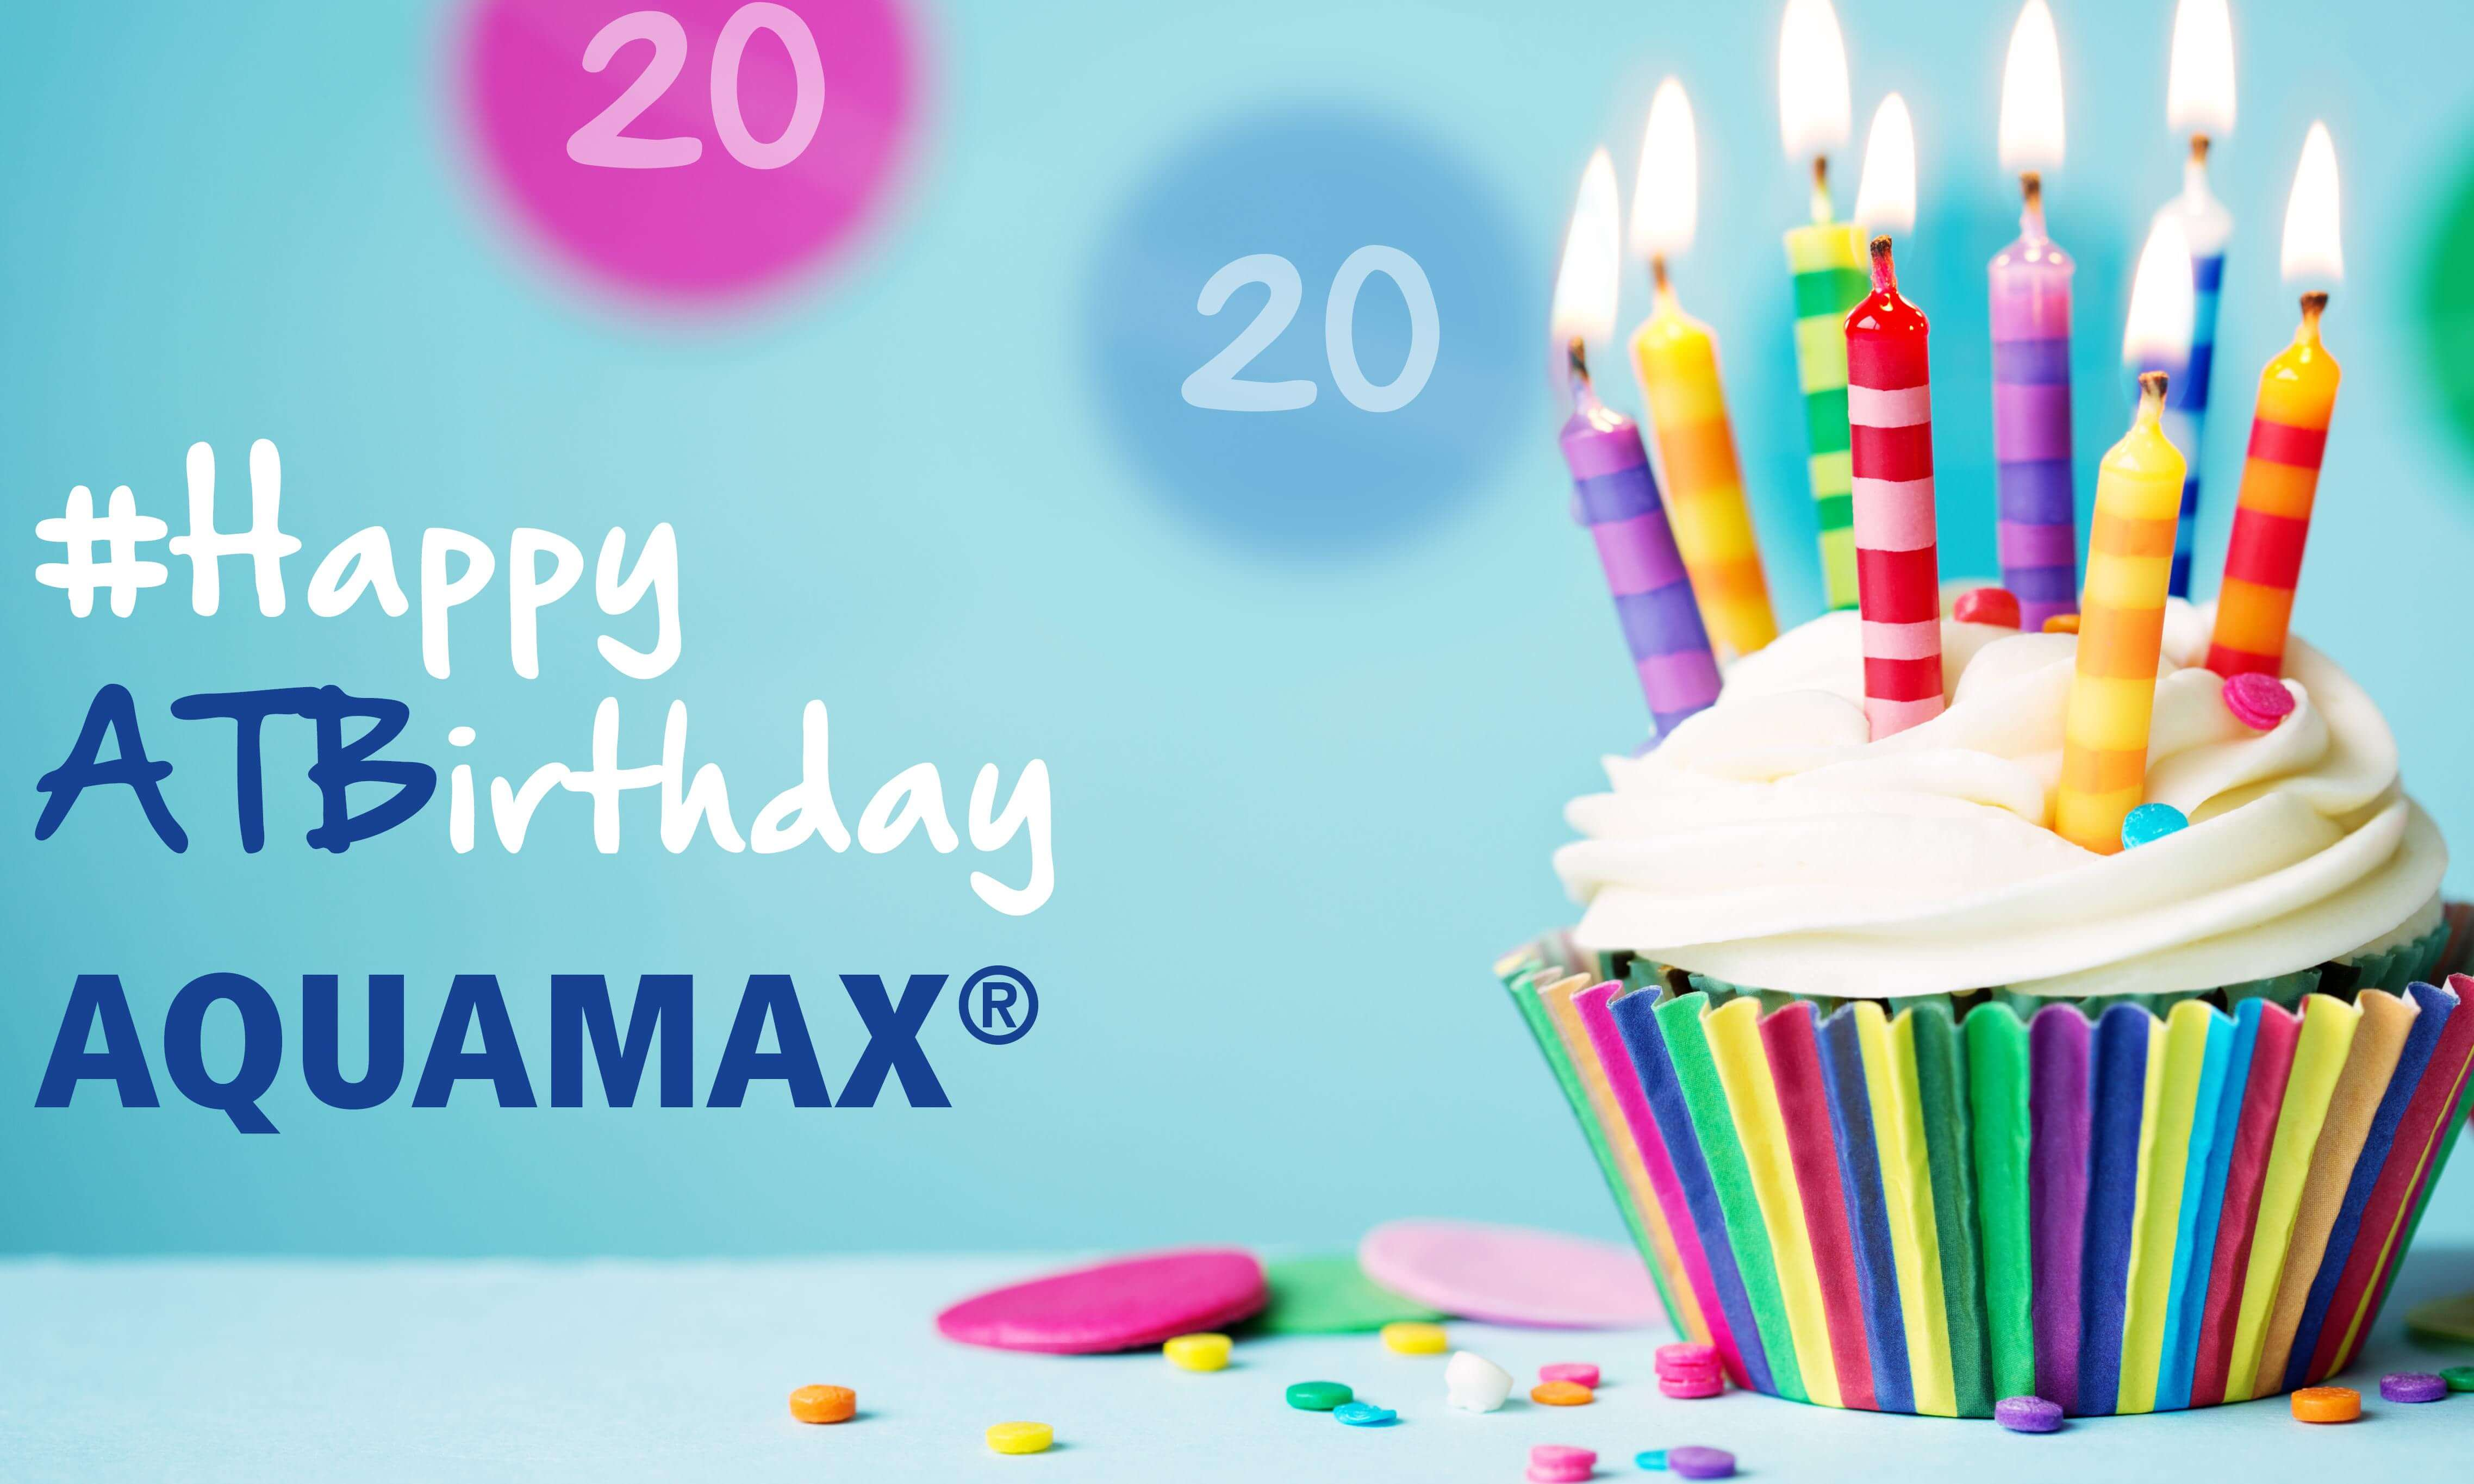 Happy ATBirthday - unser AQUAMAX ® wird 20